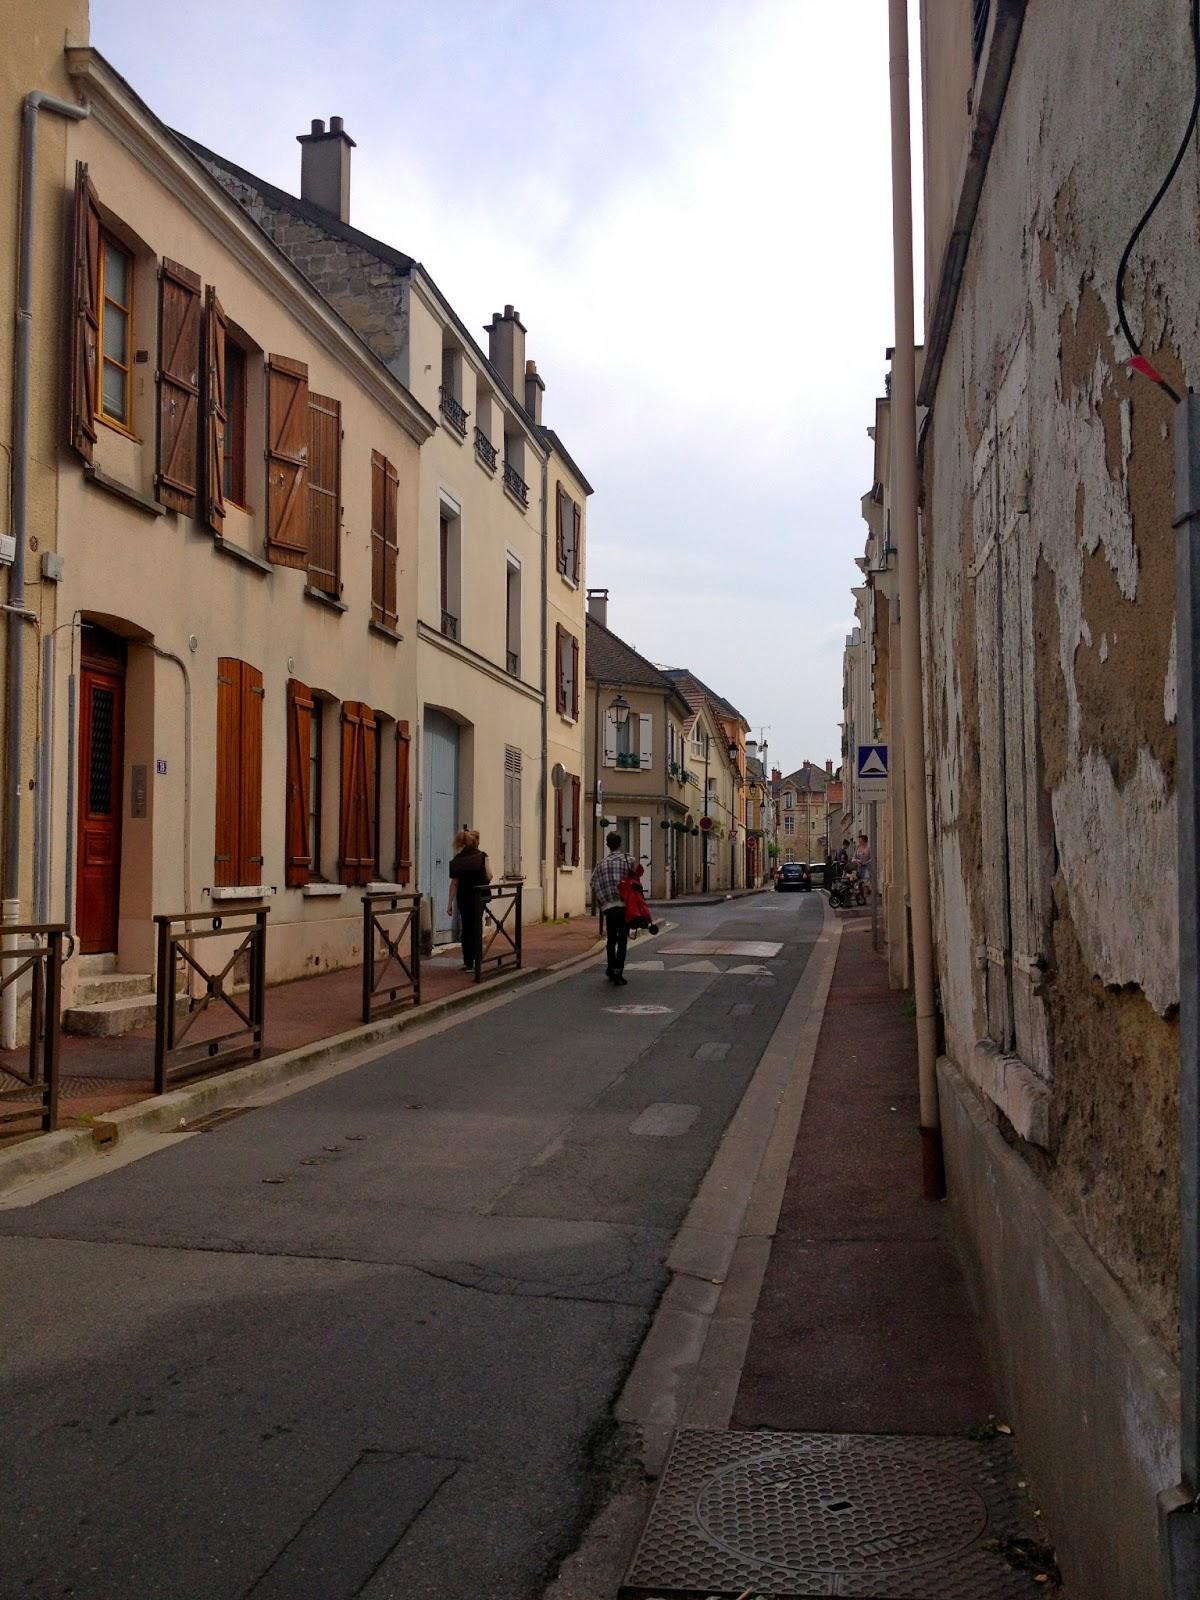 parisian day trip maisons laffitte paperblog. Black Bedroom Furniture Sets. Home Design Ideas